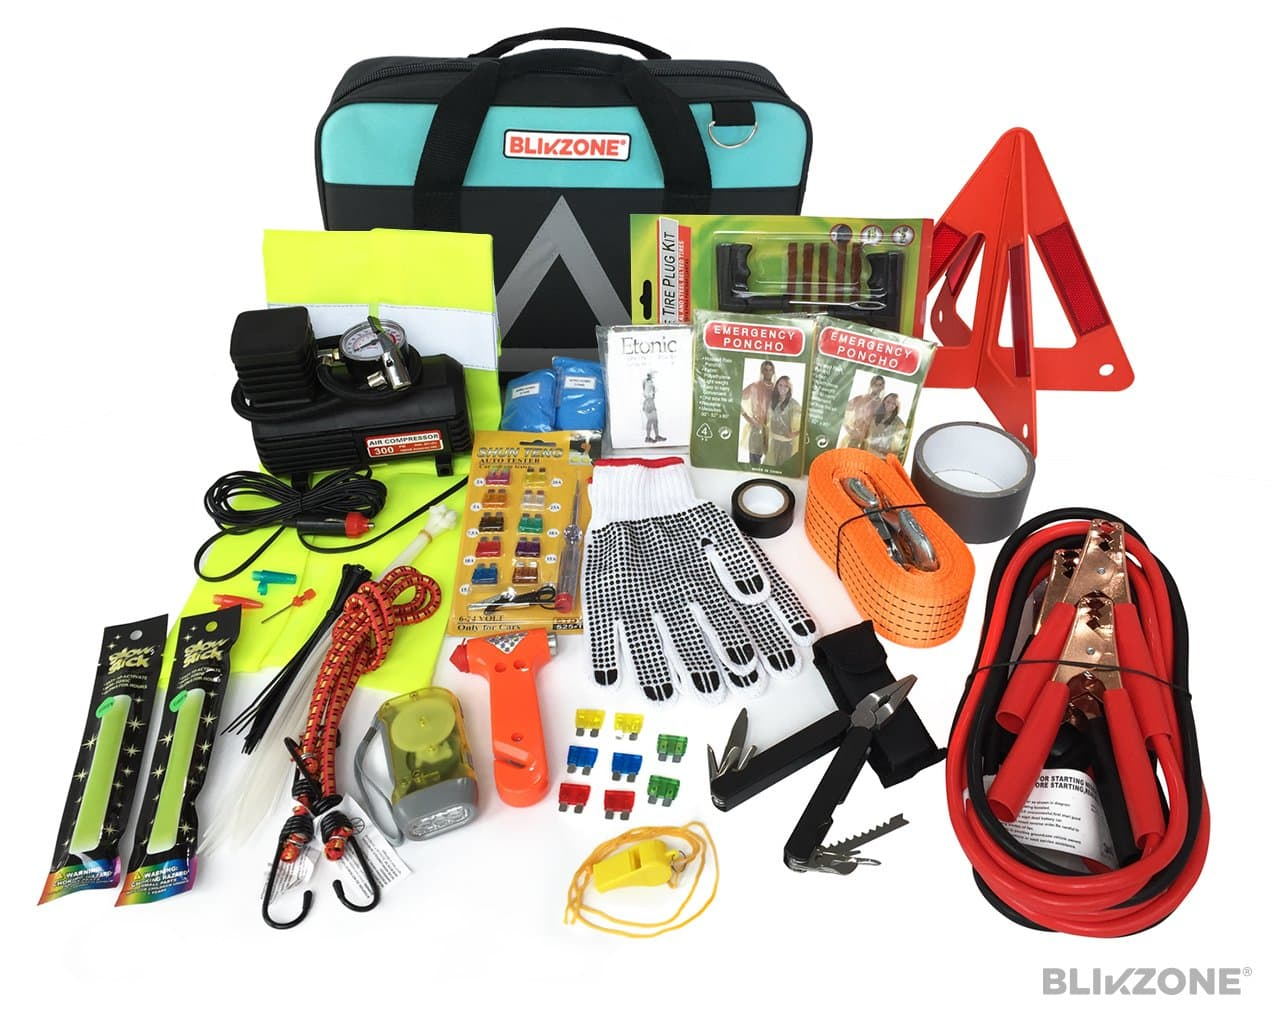 Top 10 Best Roadside Emergency Kits in 2020 Reviews & Buyer's Guide